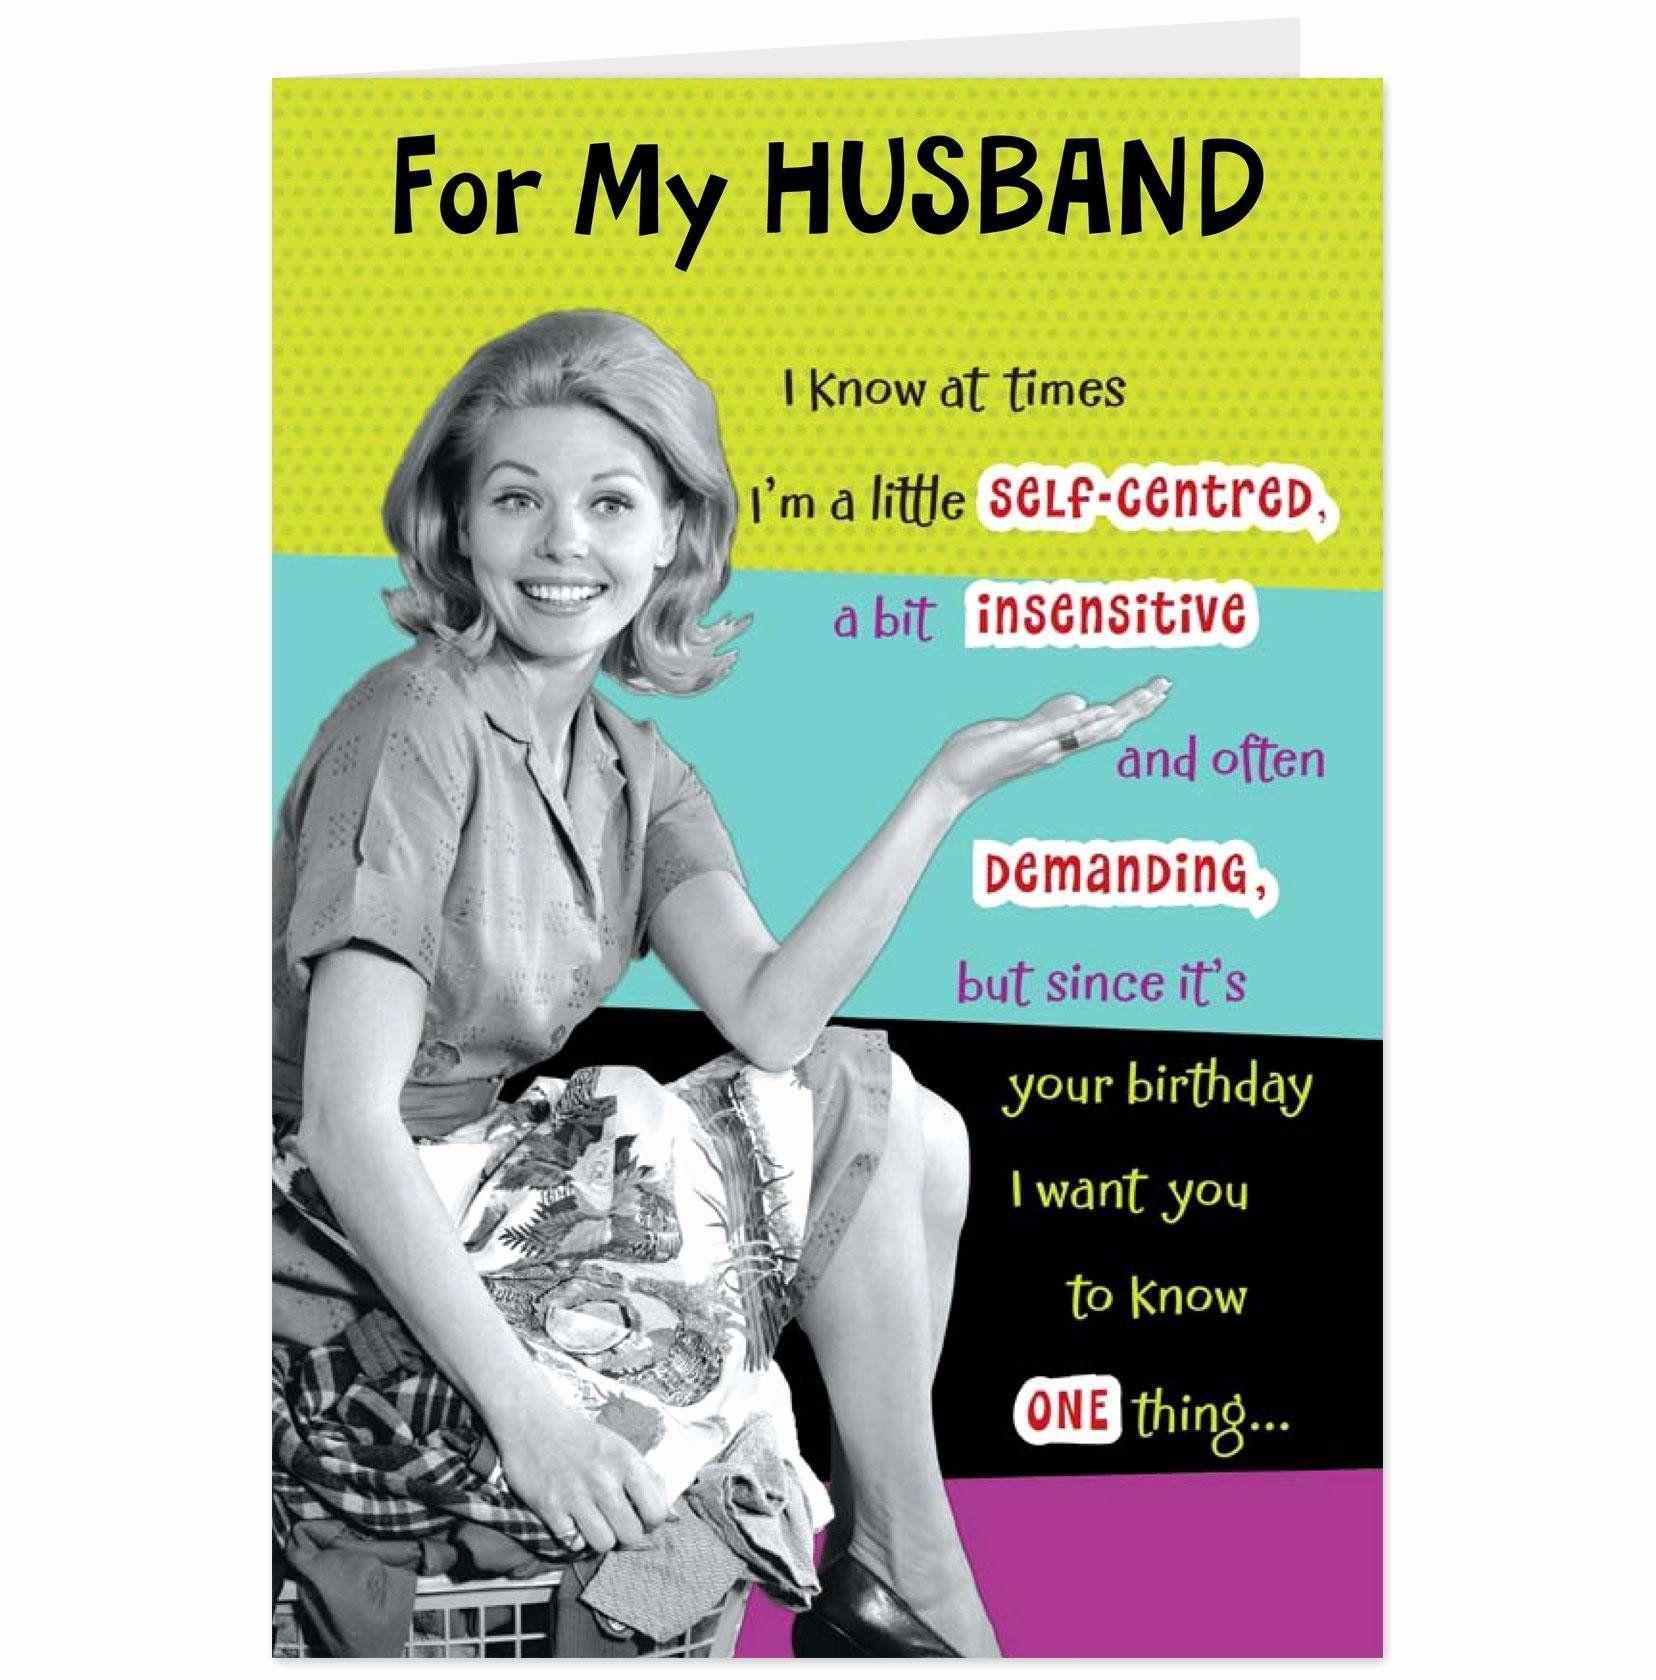 Cheesy happy birthday in 2020 birthday wish for husband